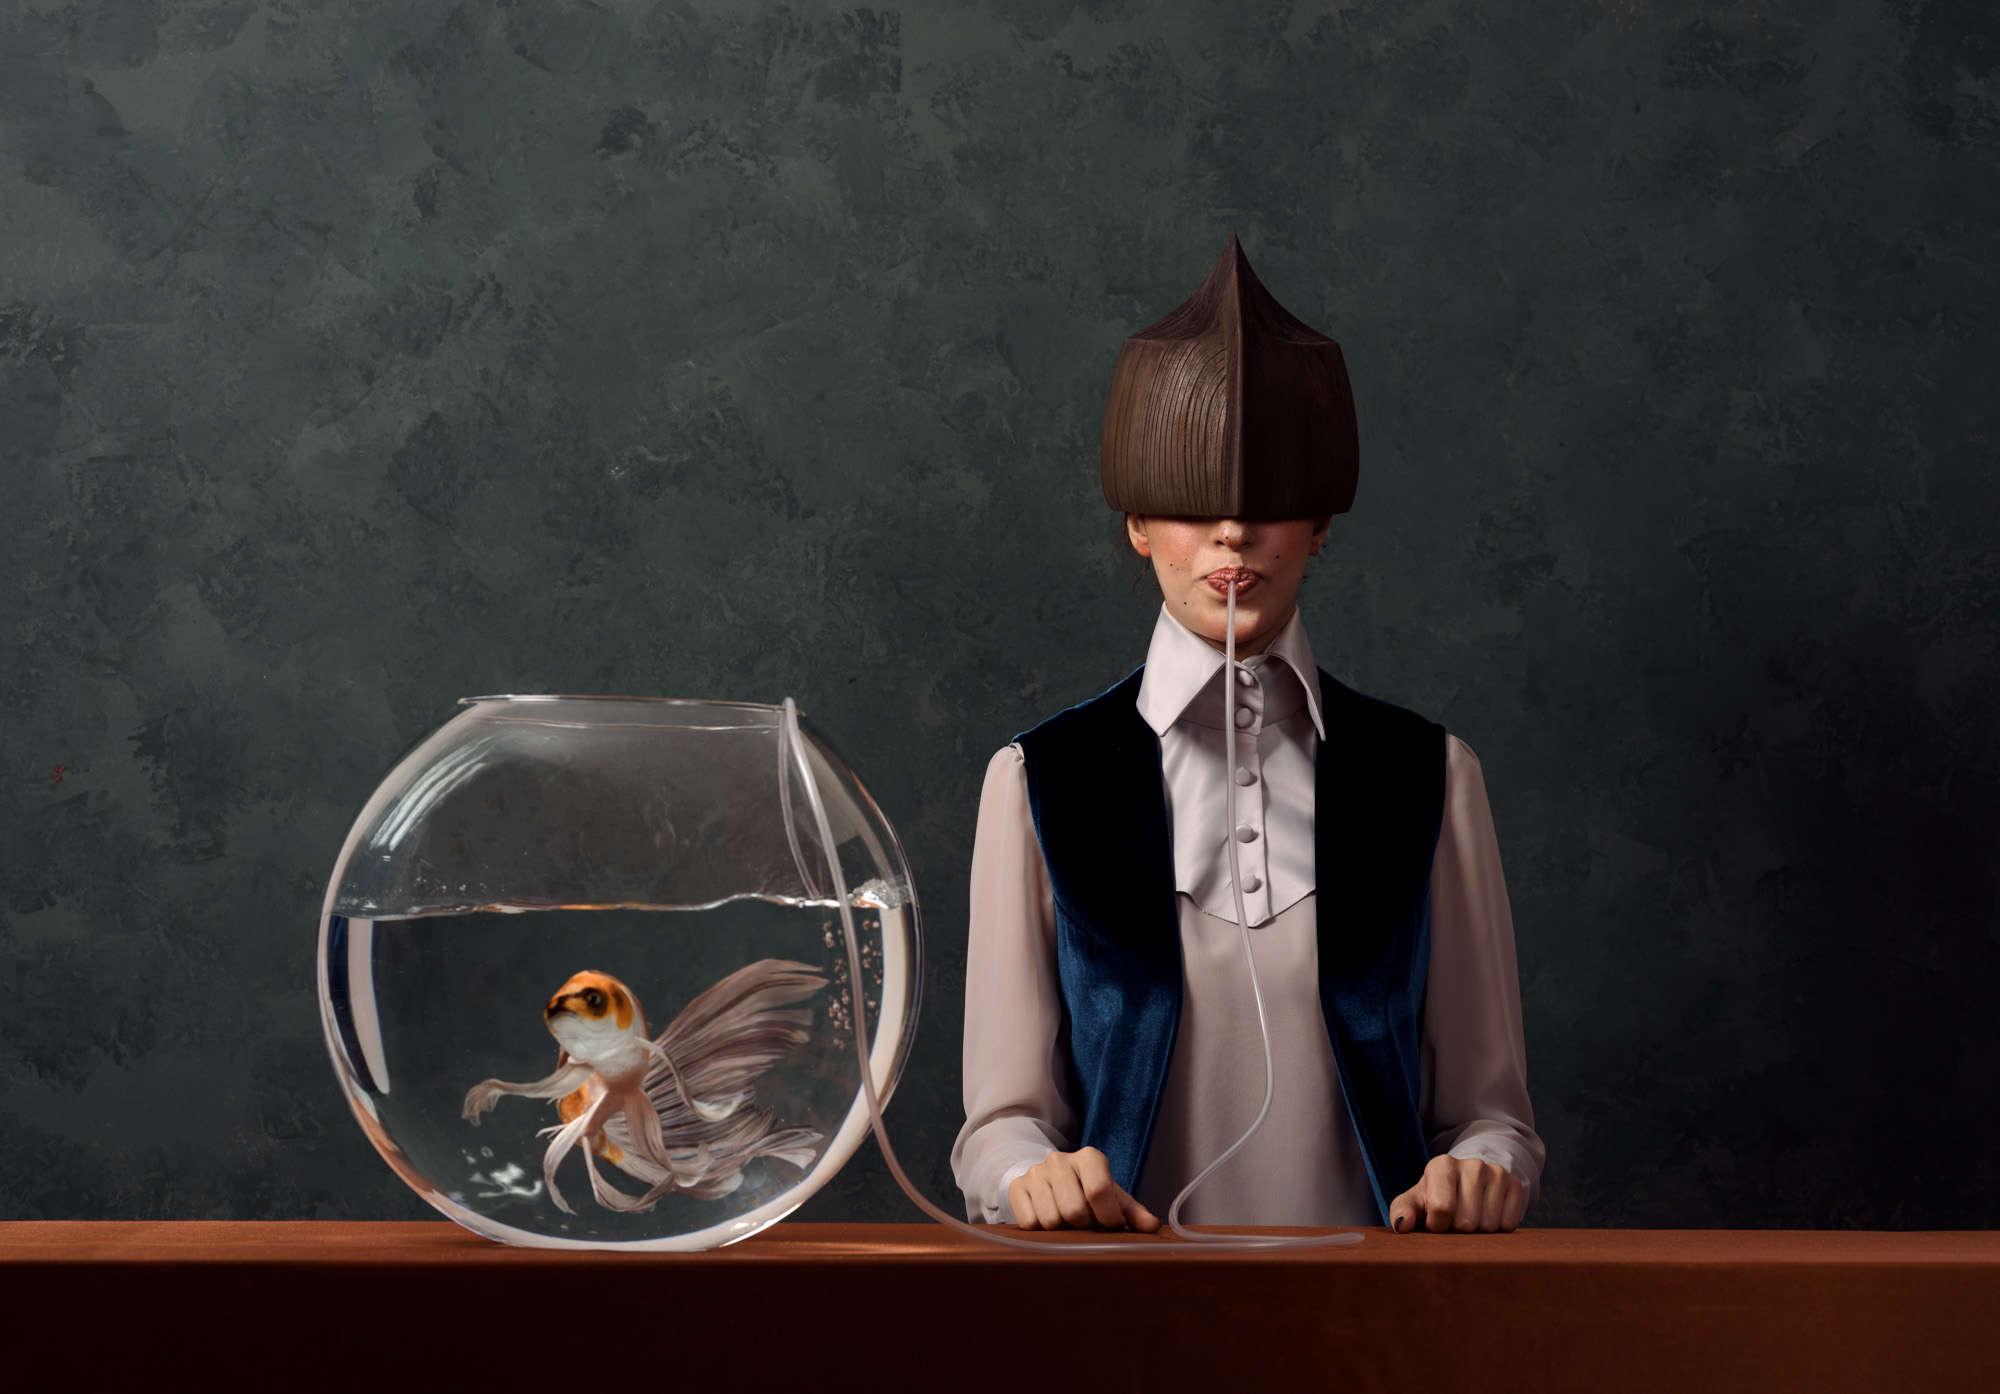 Peyman Naderi - Contradiction